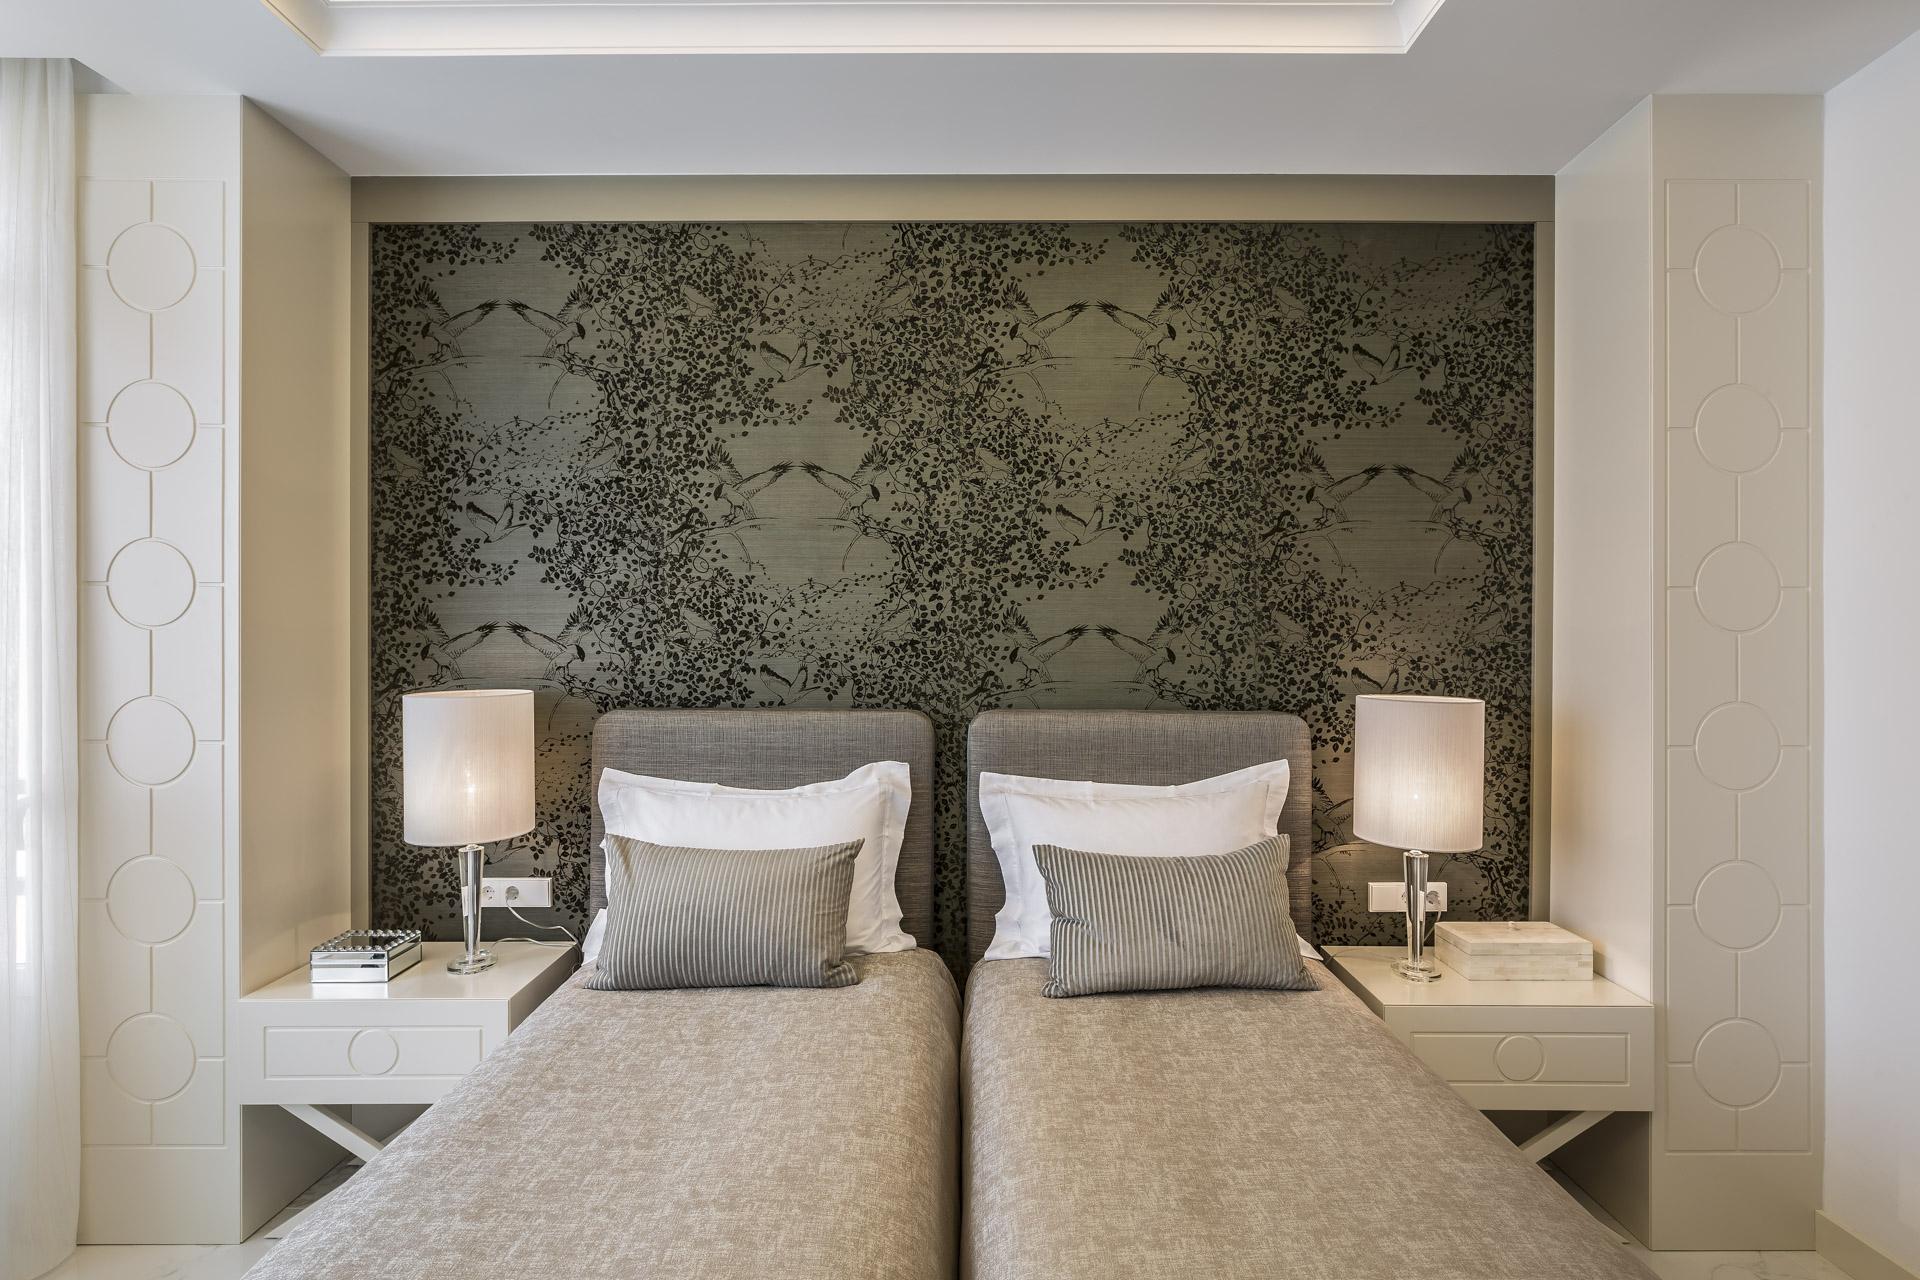 fotografia-arquitectura-valencia-interiorismo-german-cabo-laura-yerpes-apartamento-12